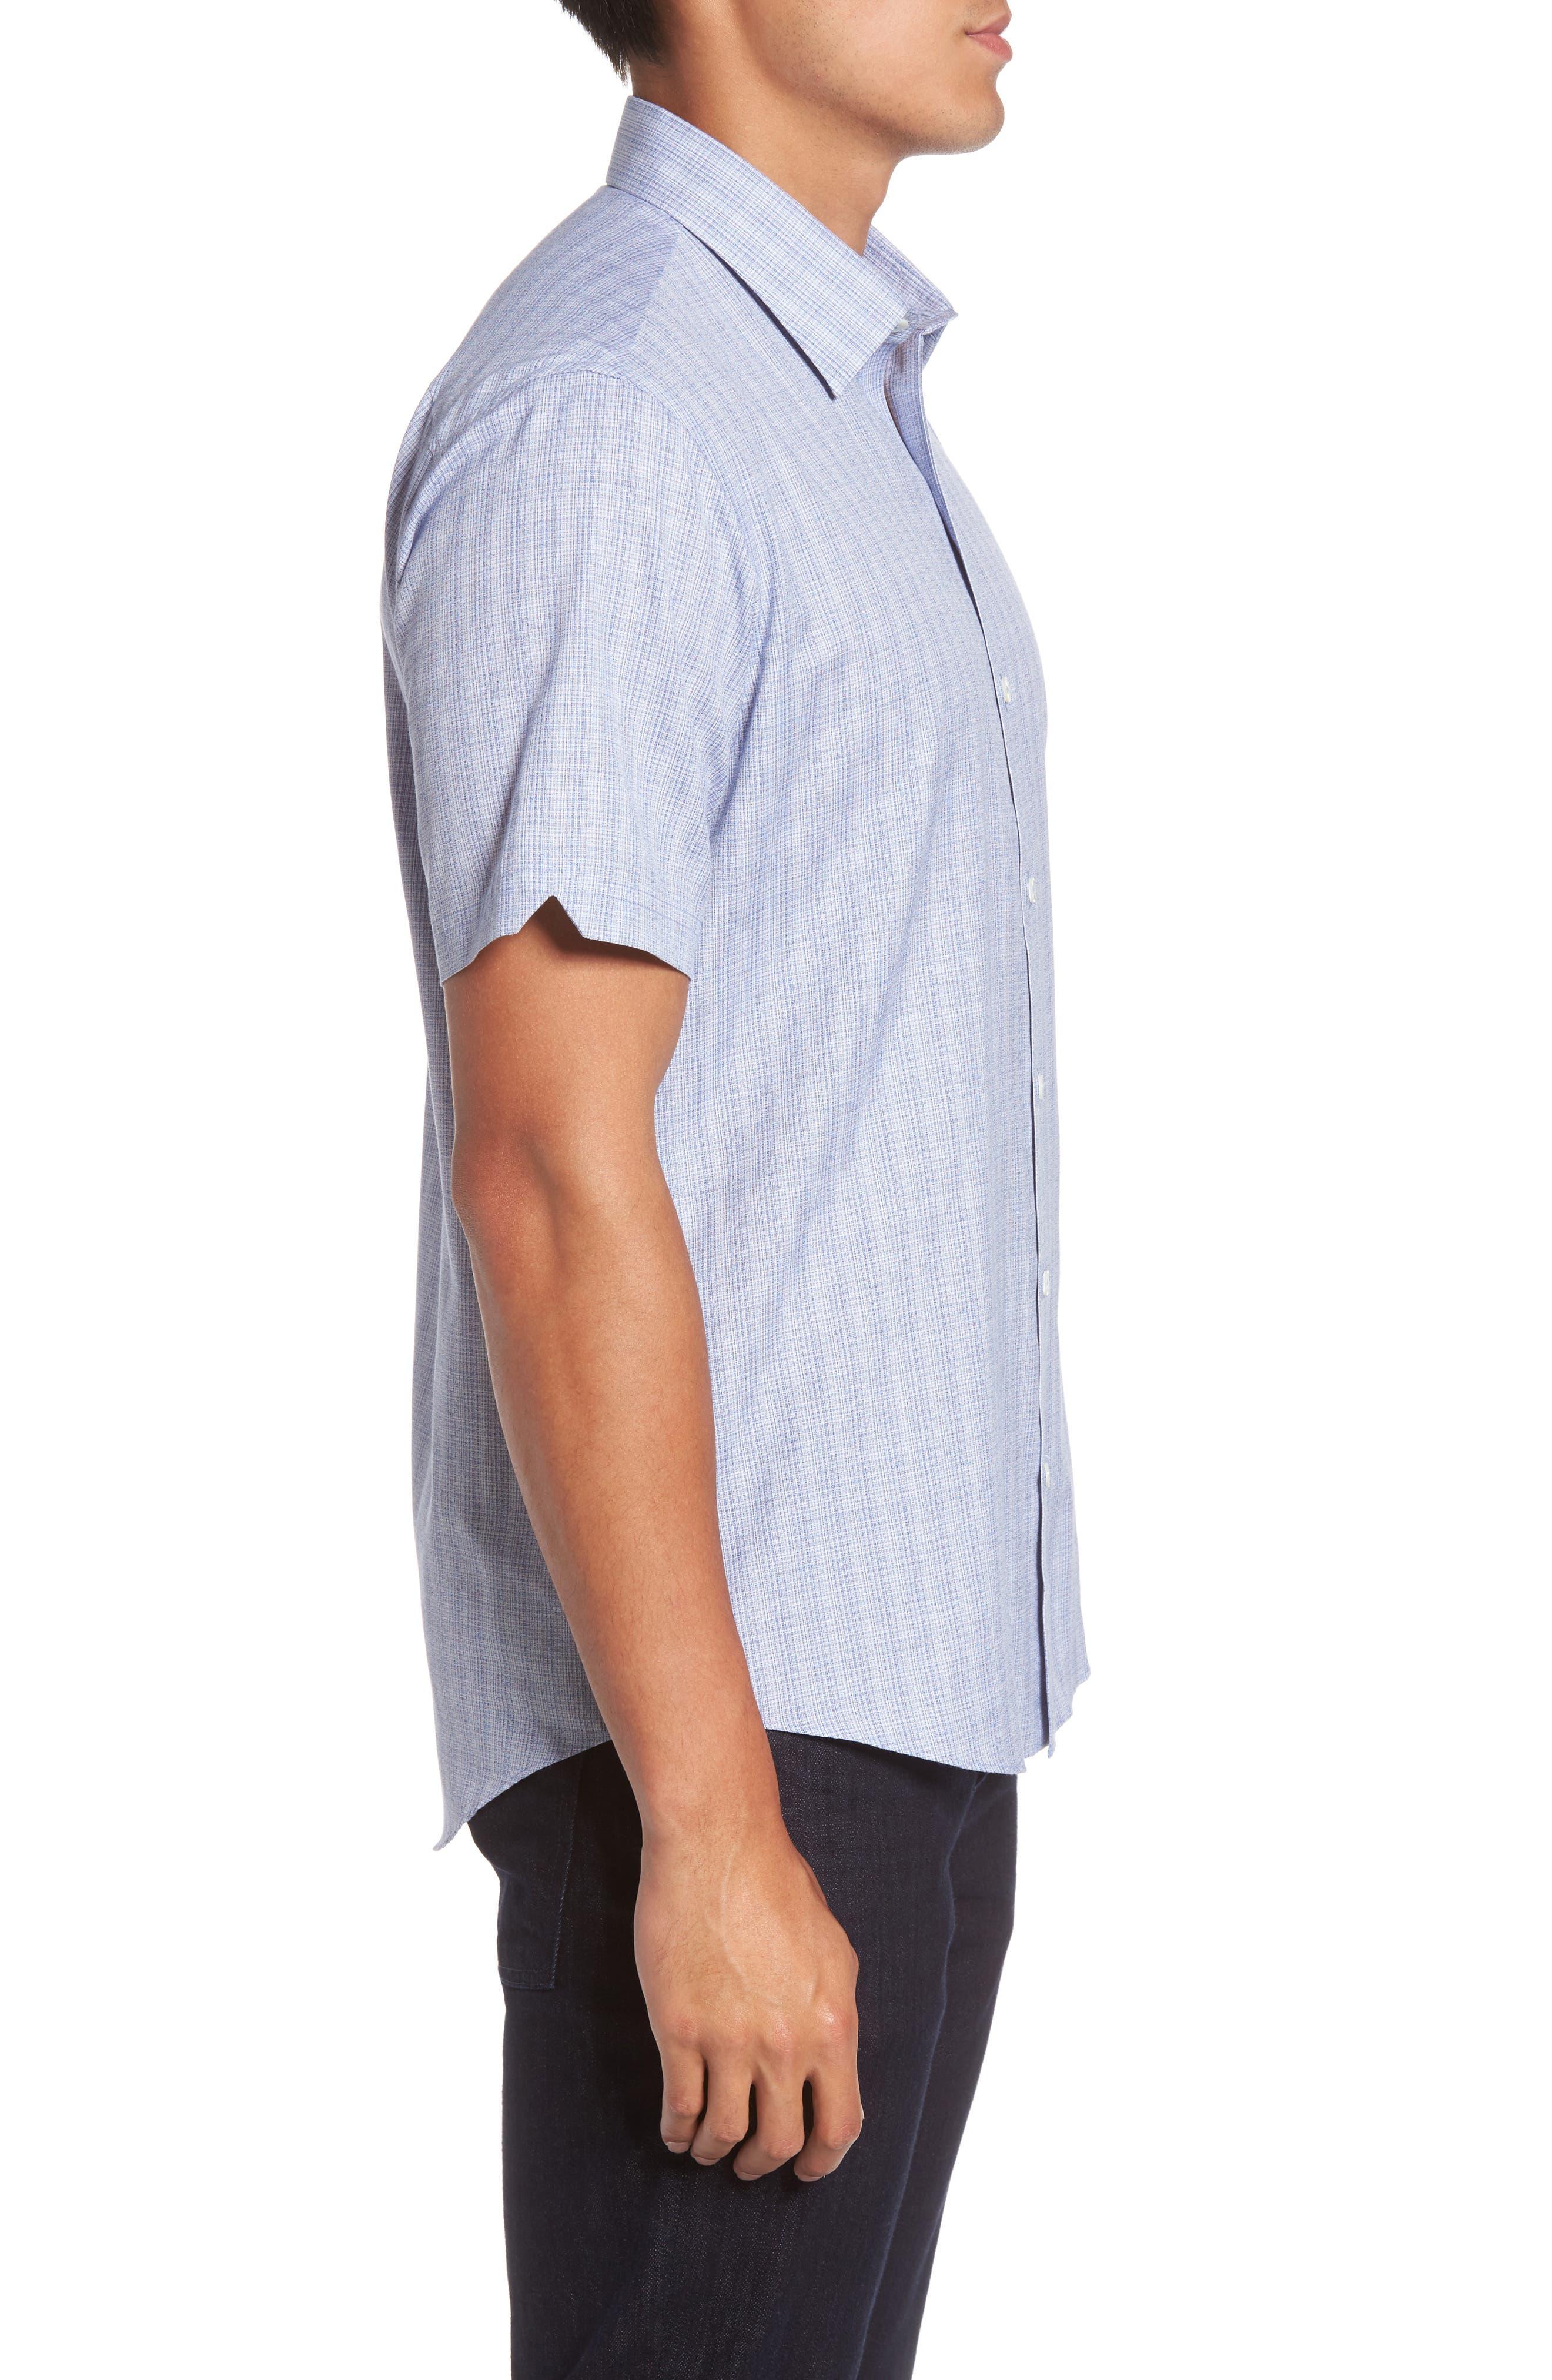 Zimmerman Check Sport Shirt,                             Alternate thumbnail 3, color,                             400